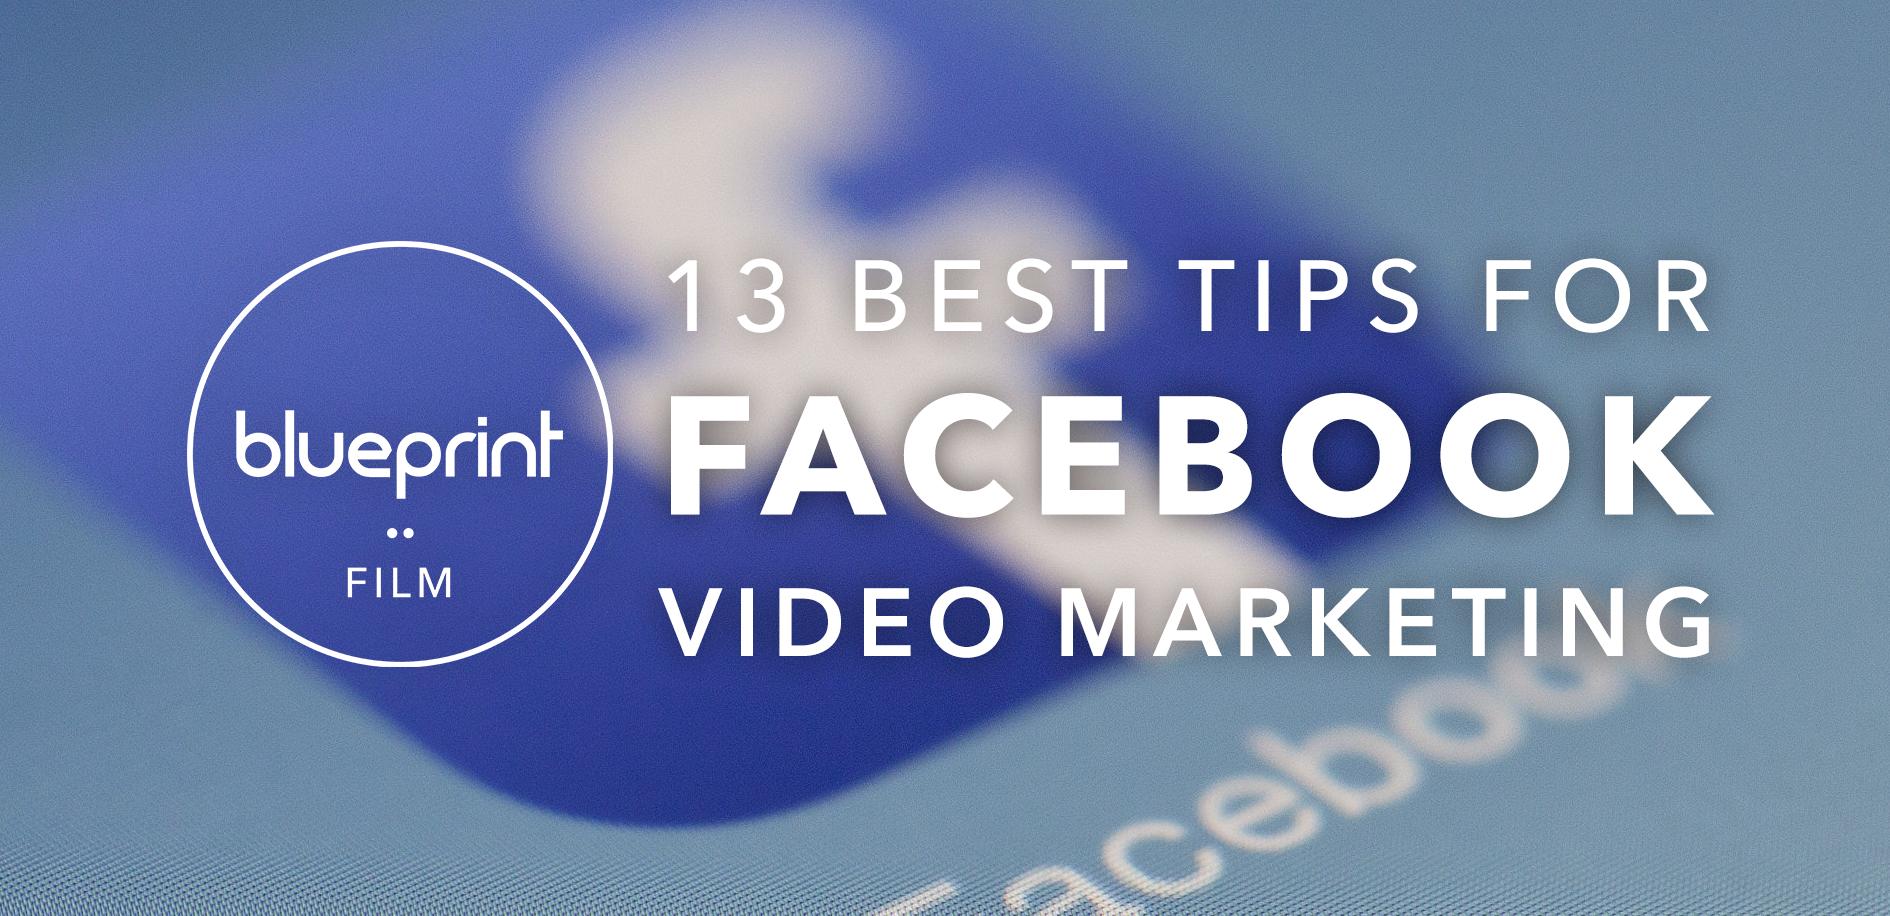 15 best tips for Facebook video marketing